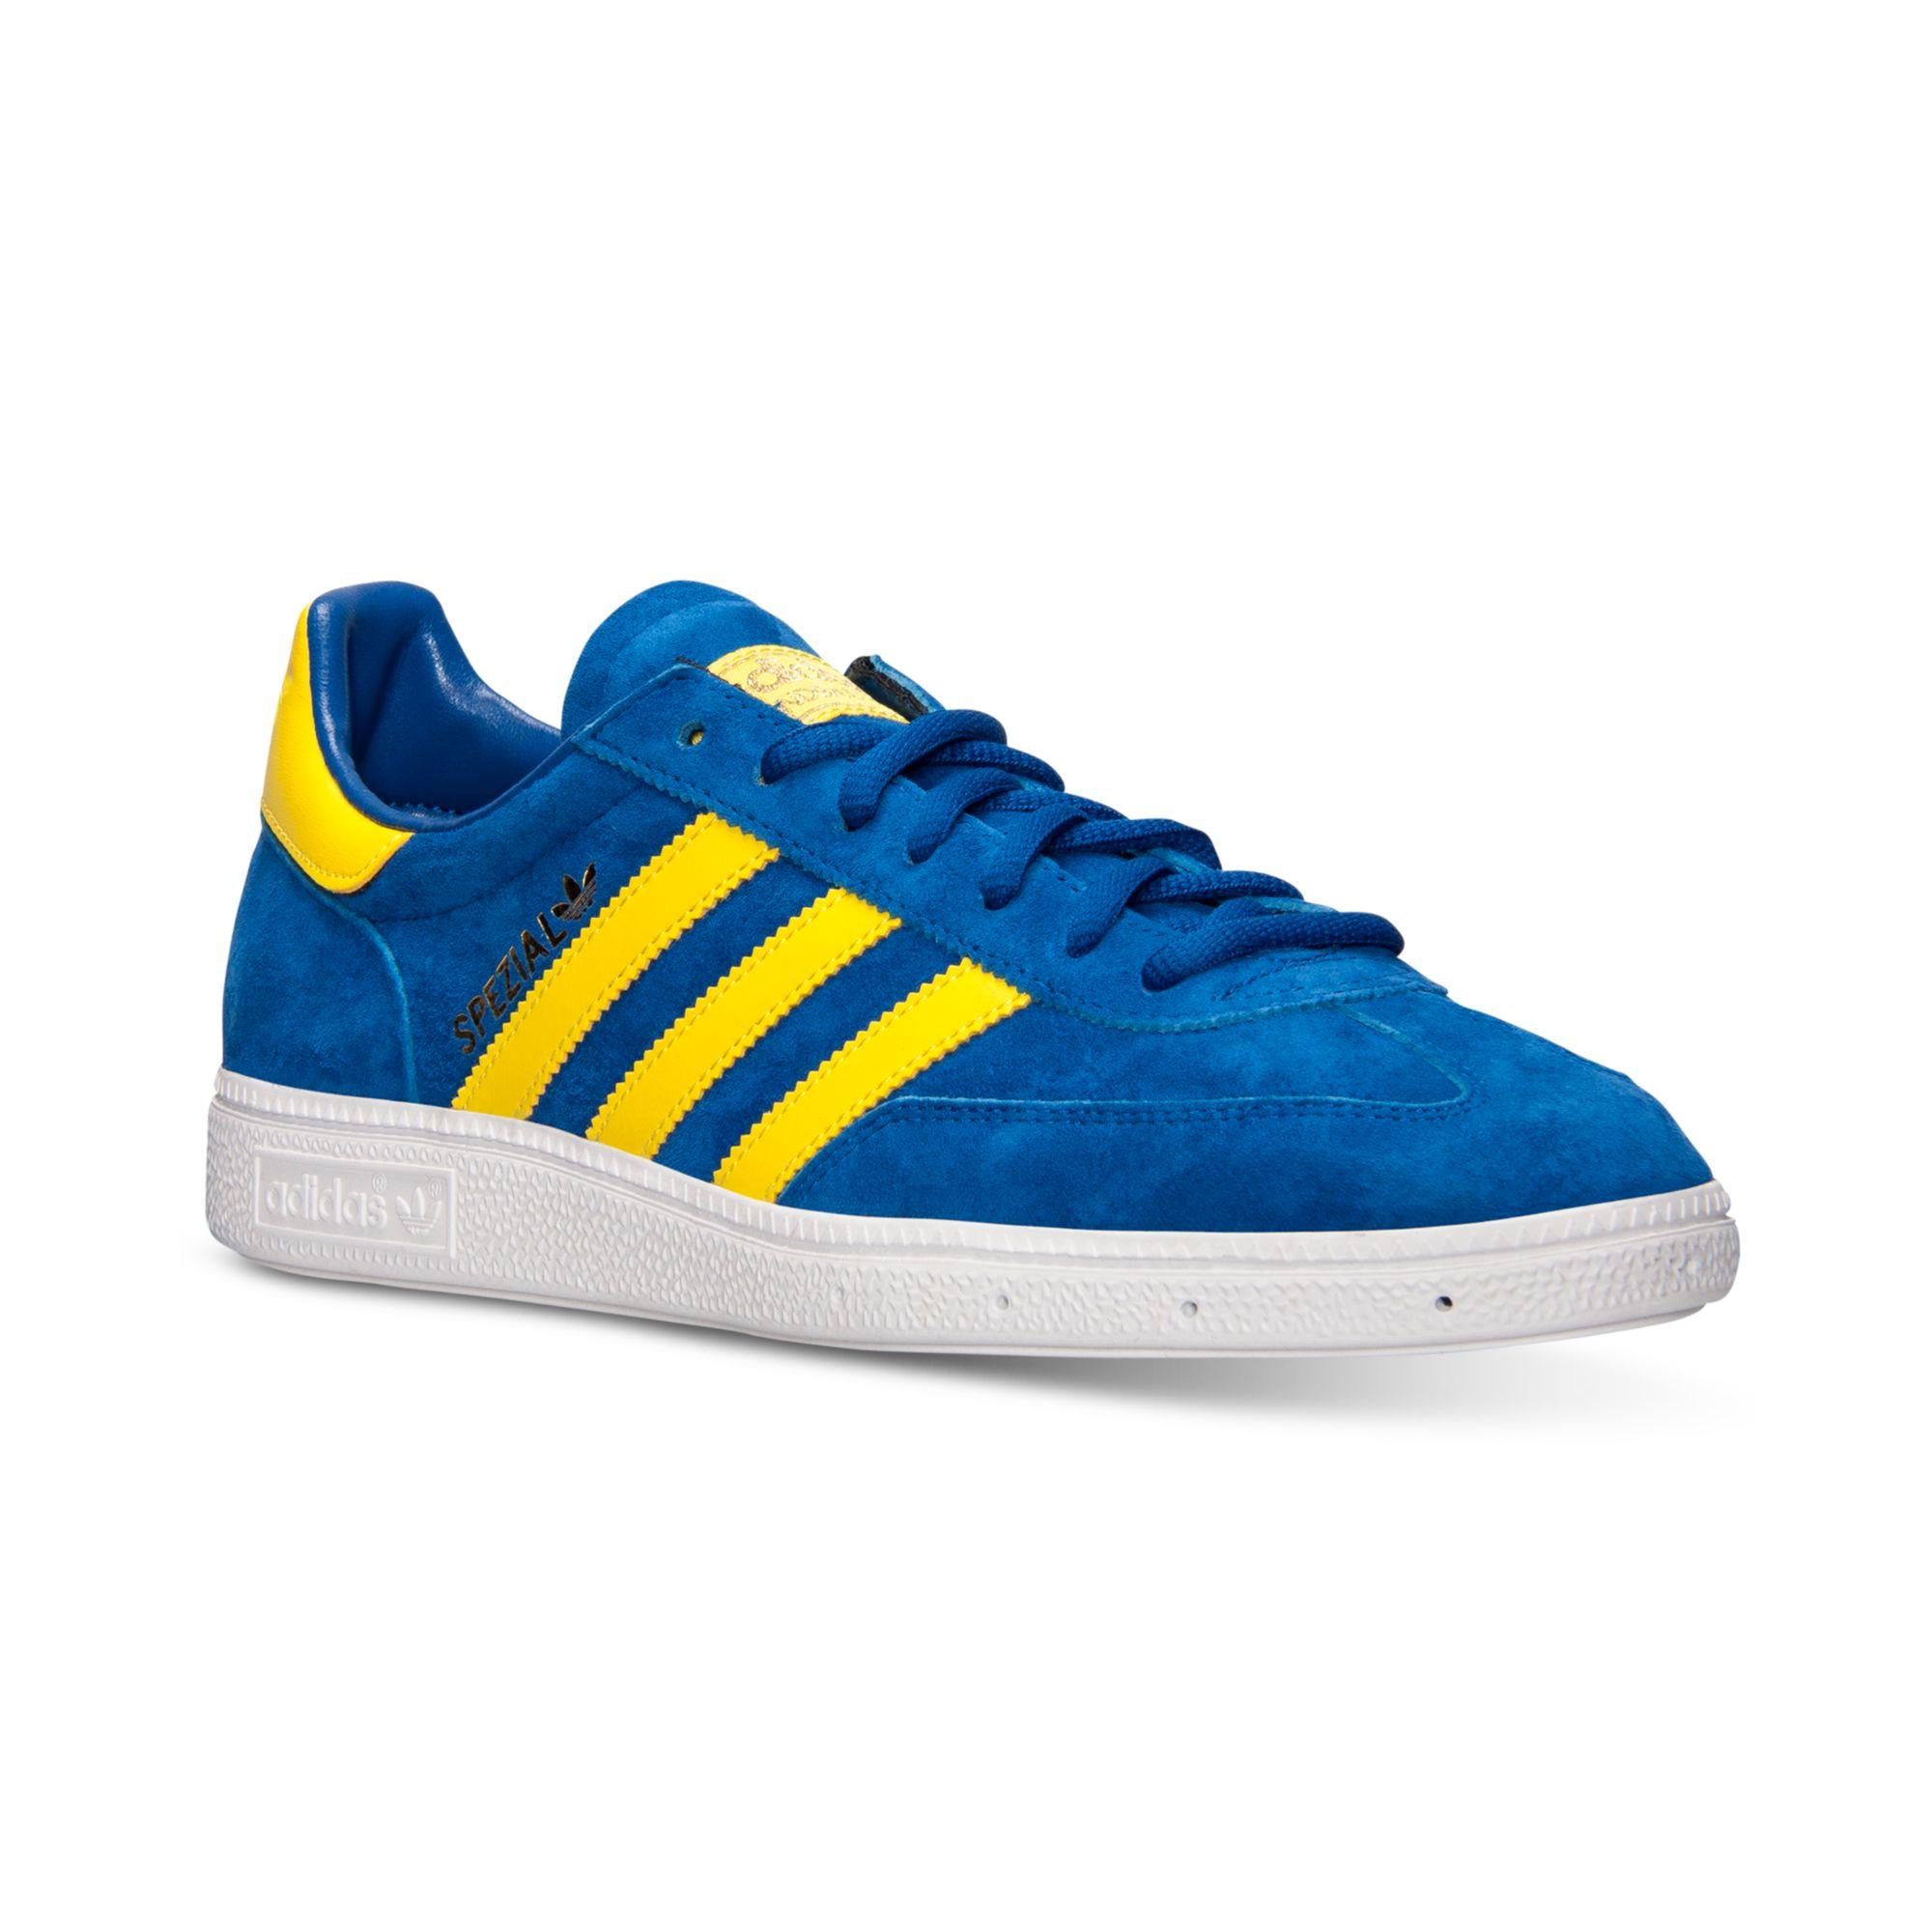 d78f55ef92302b Adidas Originals Men S Spezial Casual Sneakers From Finish